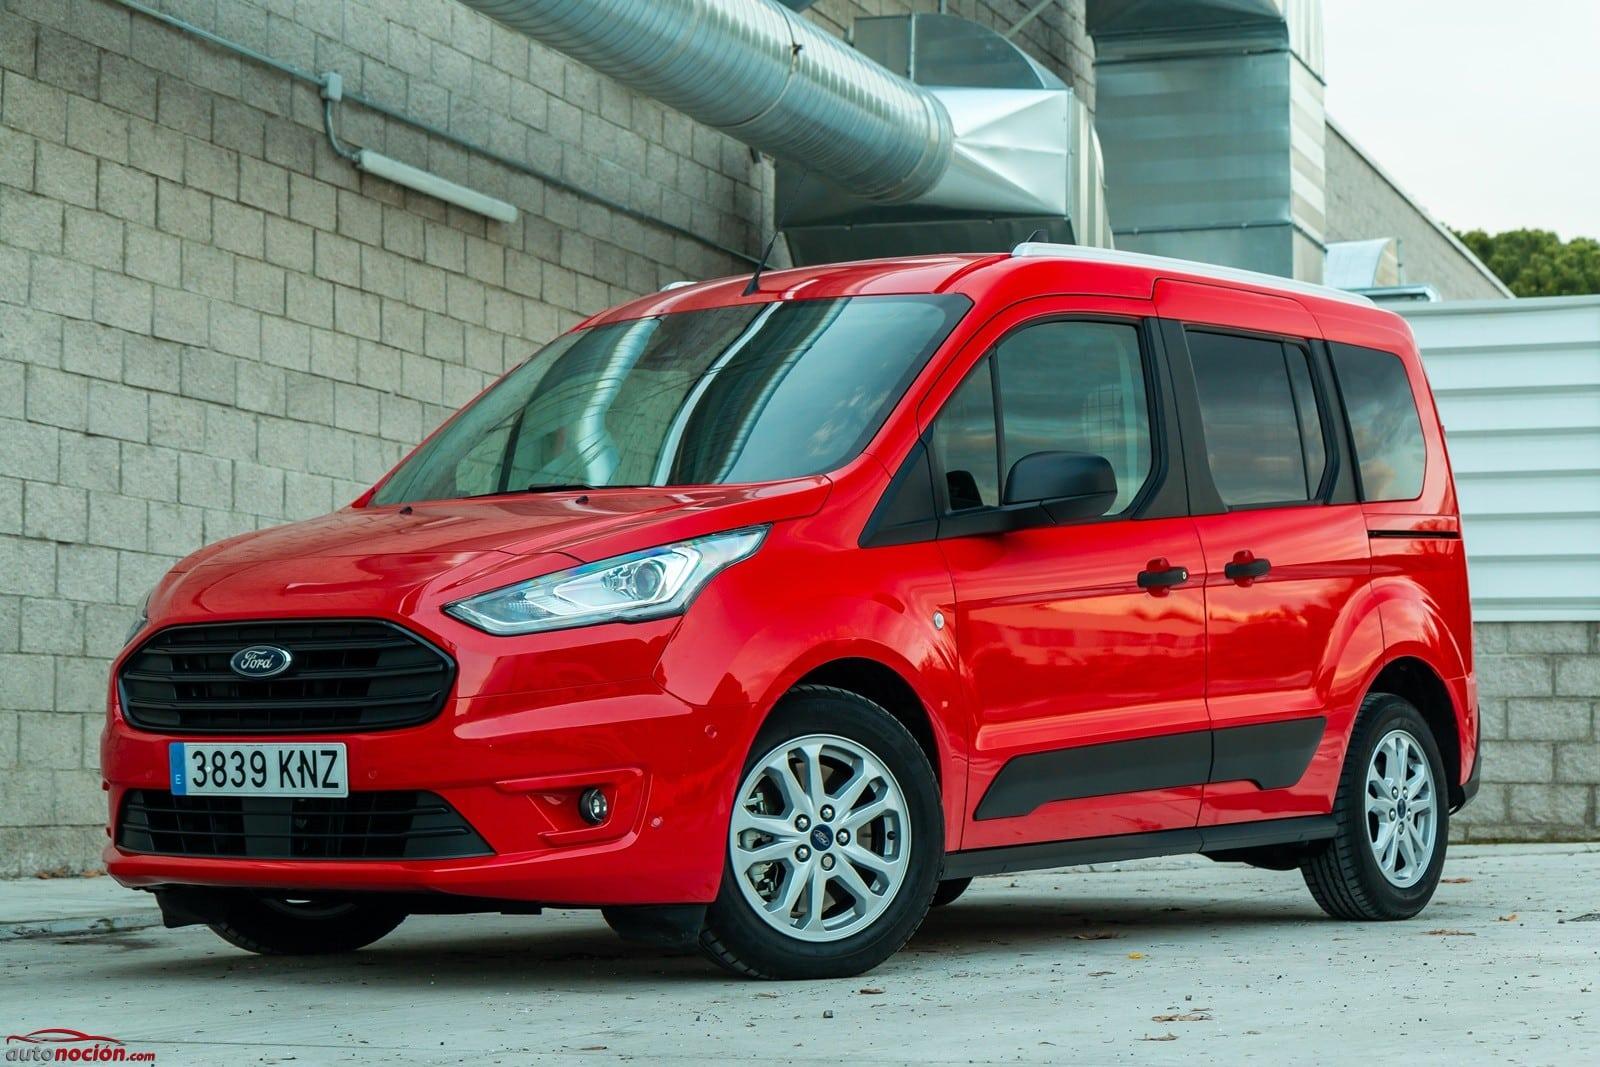 Ford fabrica varios modelos en Valencia